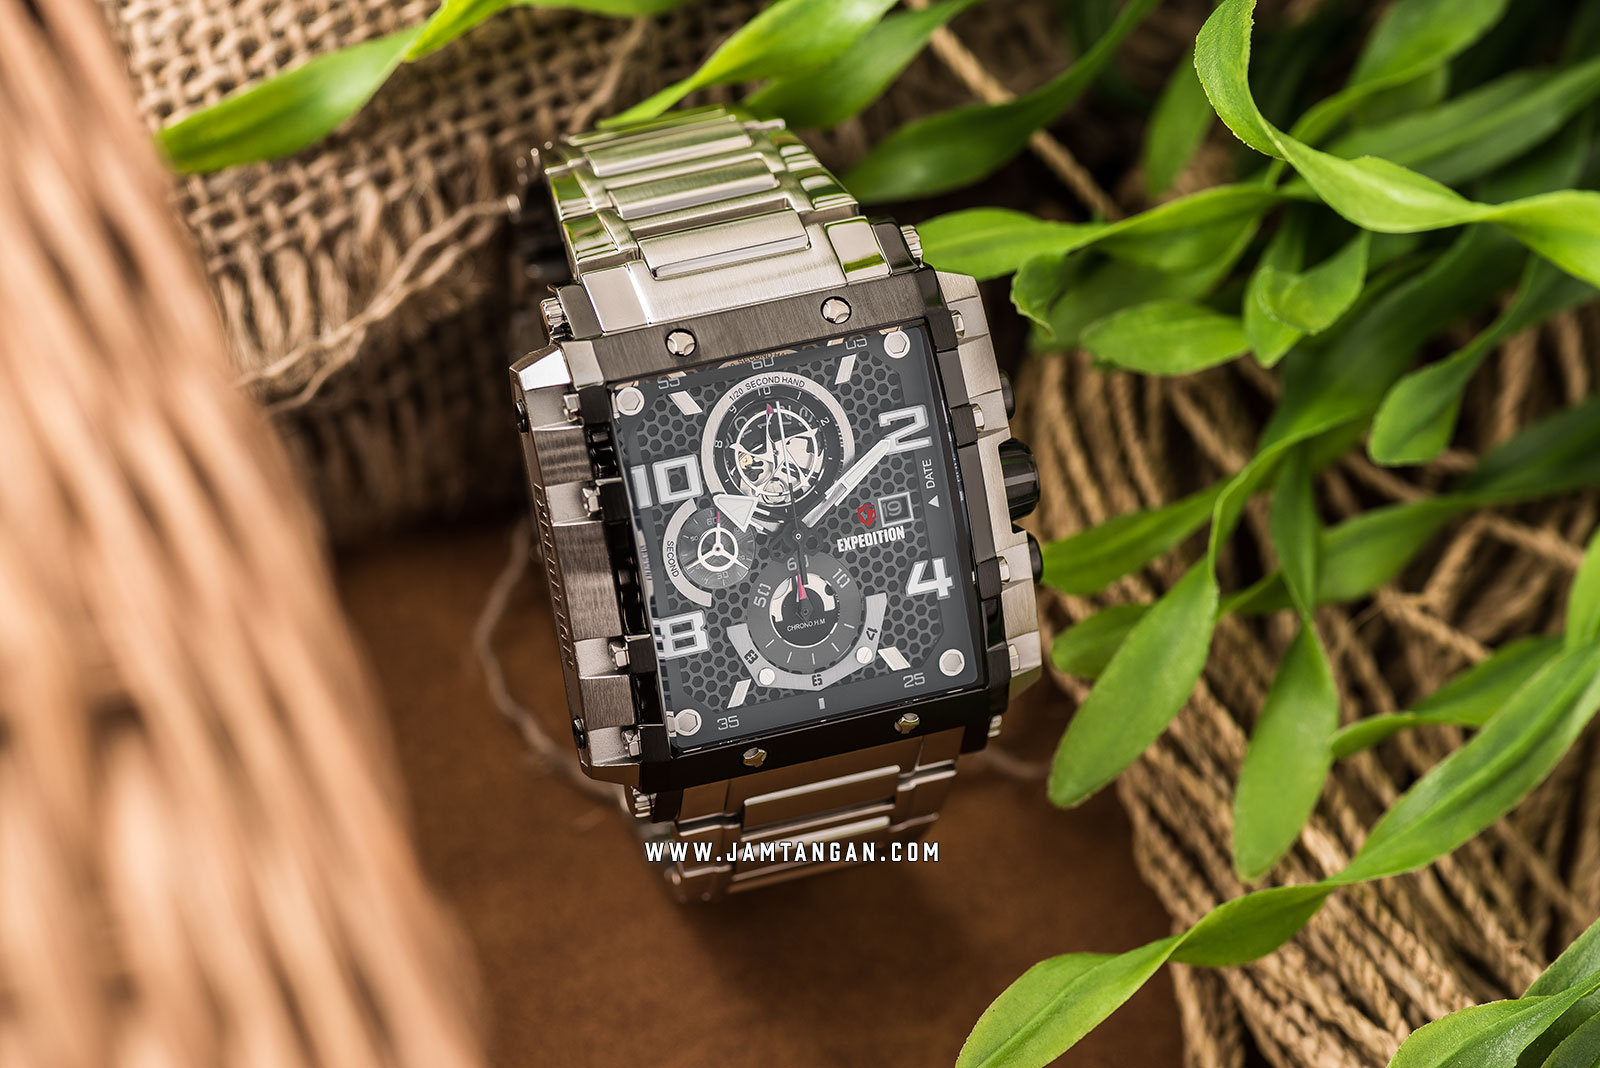 Expedition E 6757 MC BTBBA Chronograph Men Black Dial Stainless Steel Machtwatch